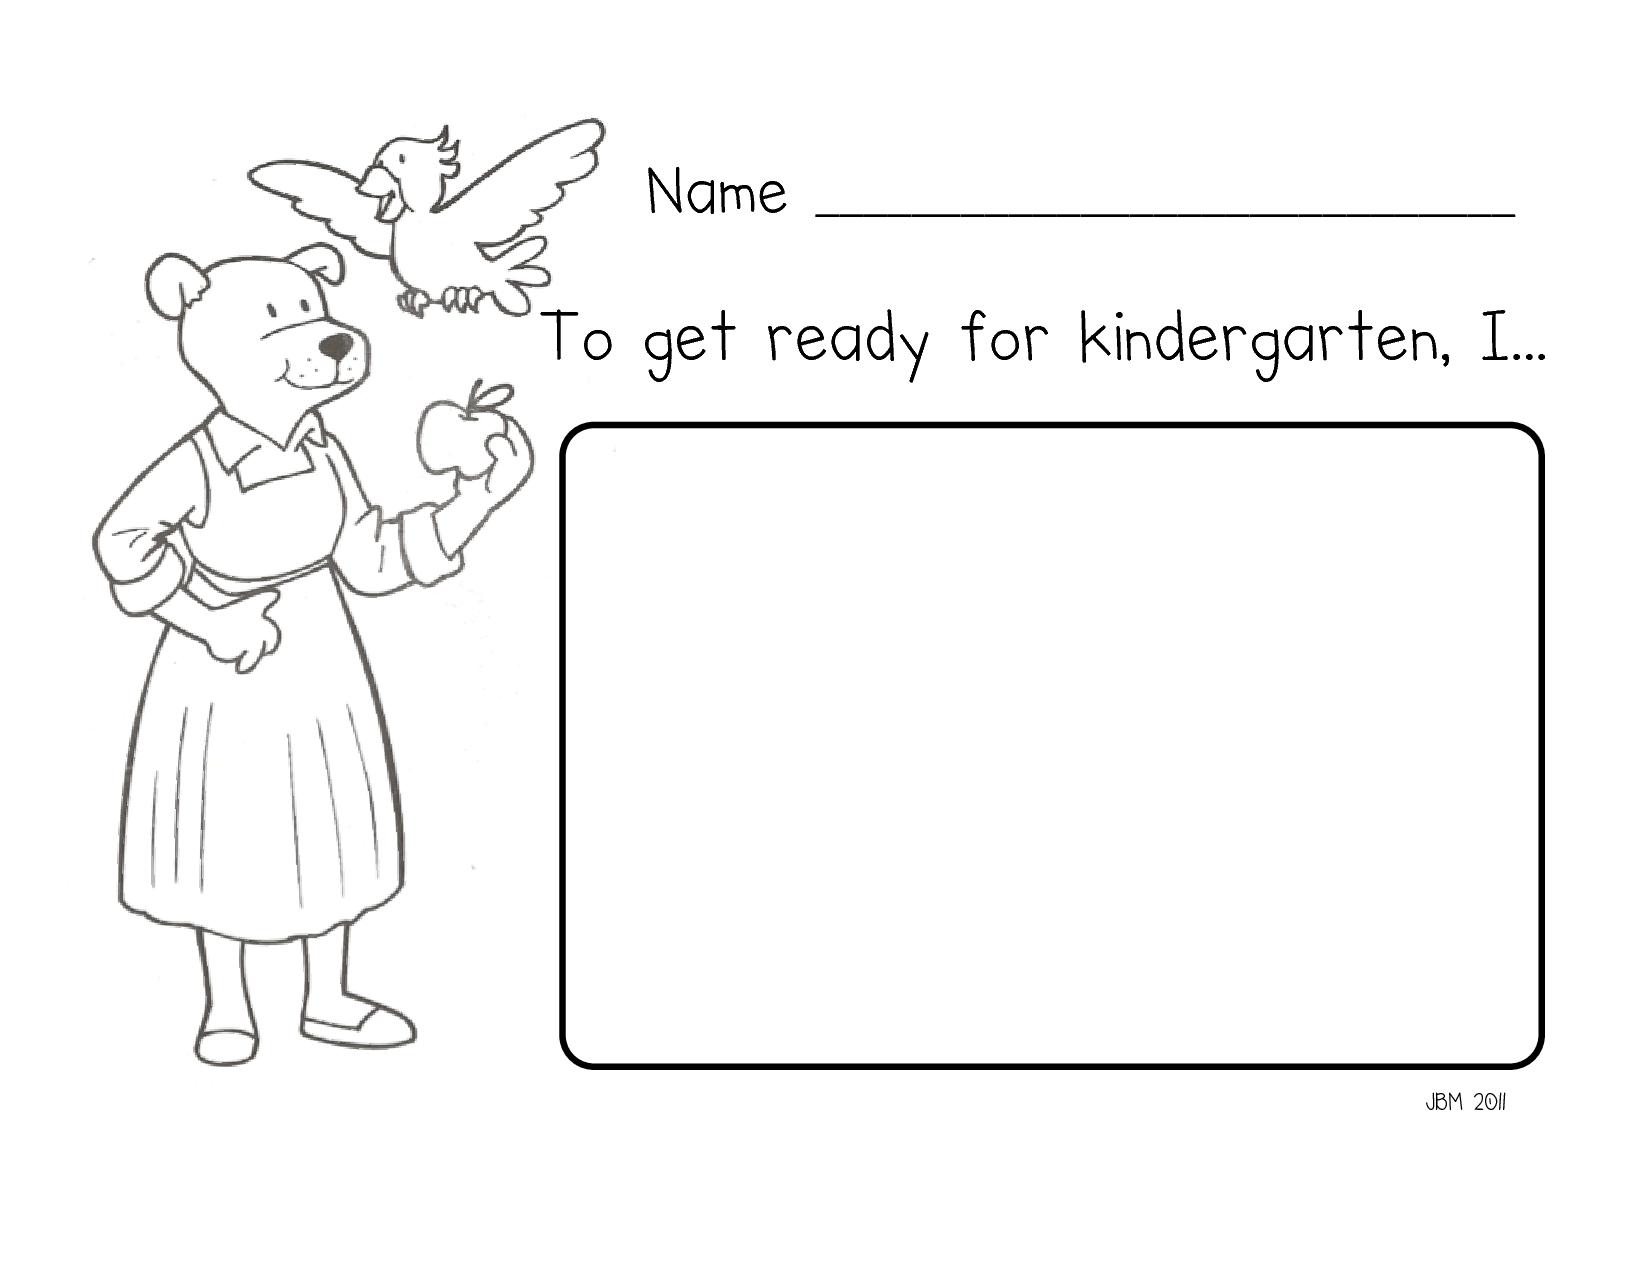 Room 131 Gets Ready For Kindergarten